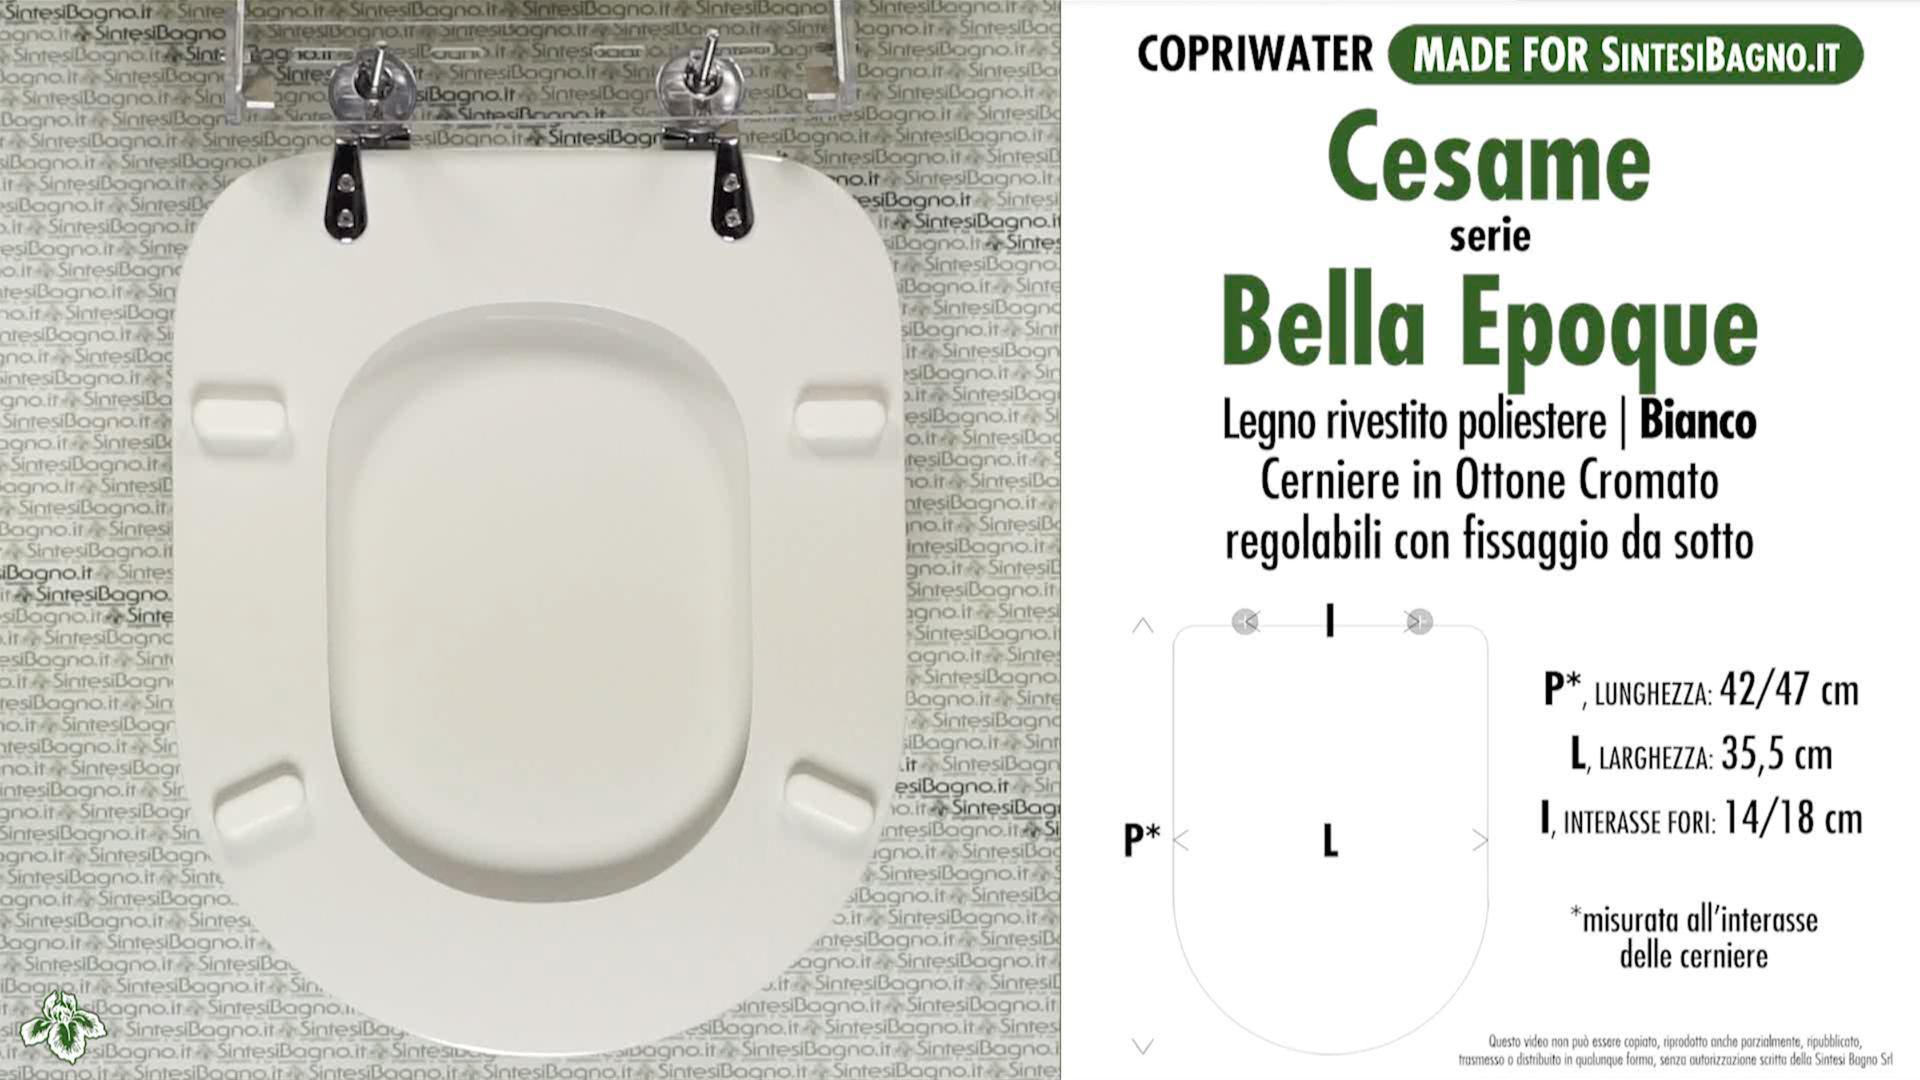 SCHEDA TECNICA MISURE copriwater CESAME BELLA EPOQUE